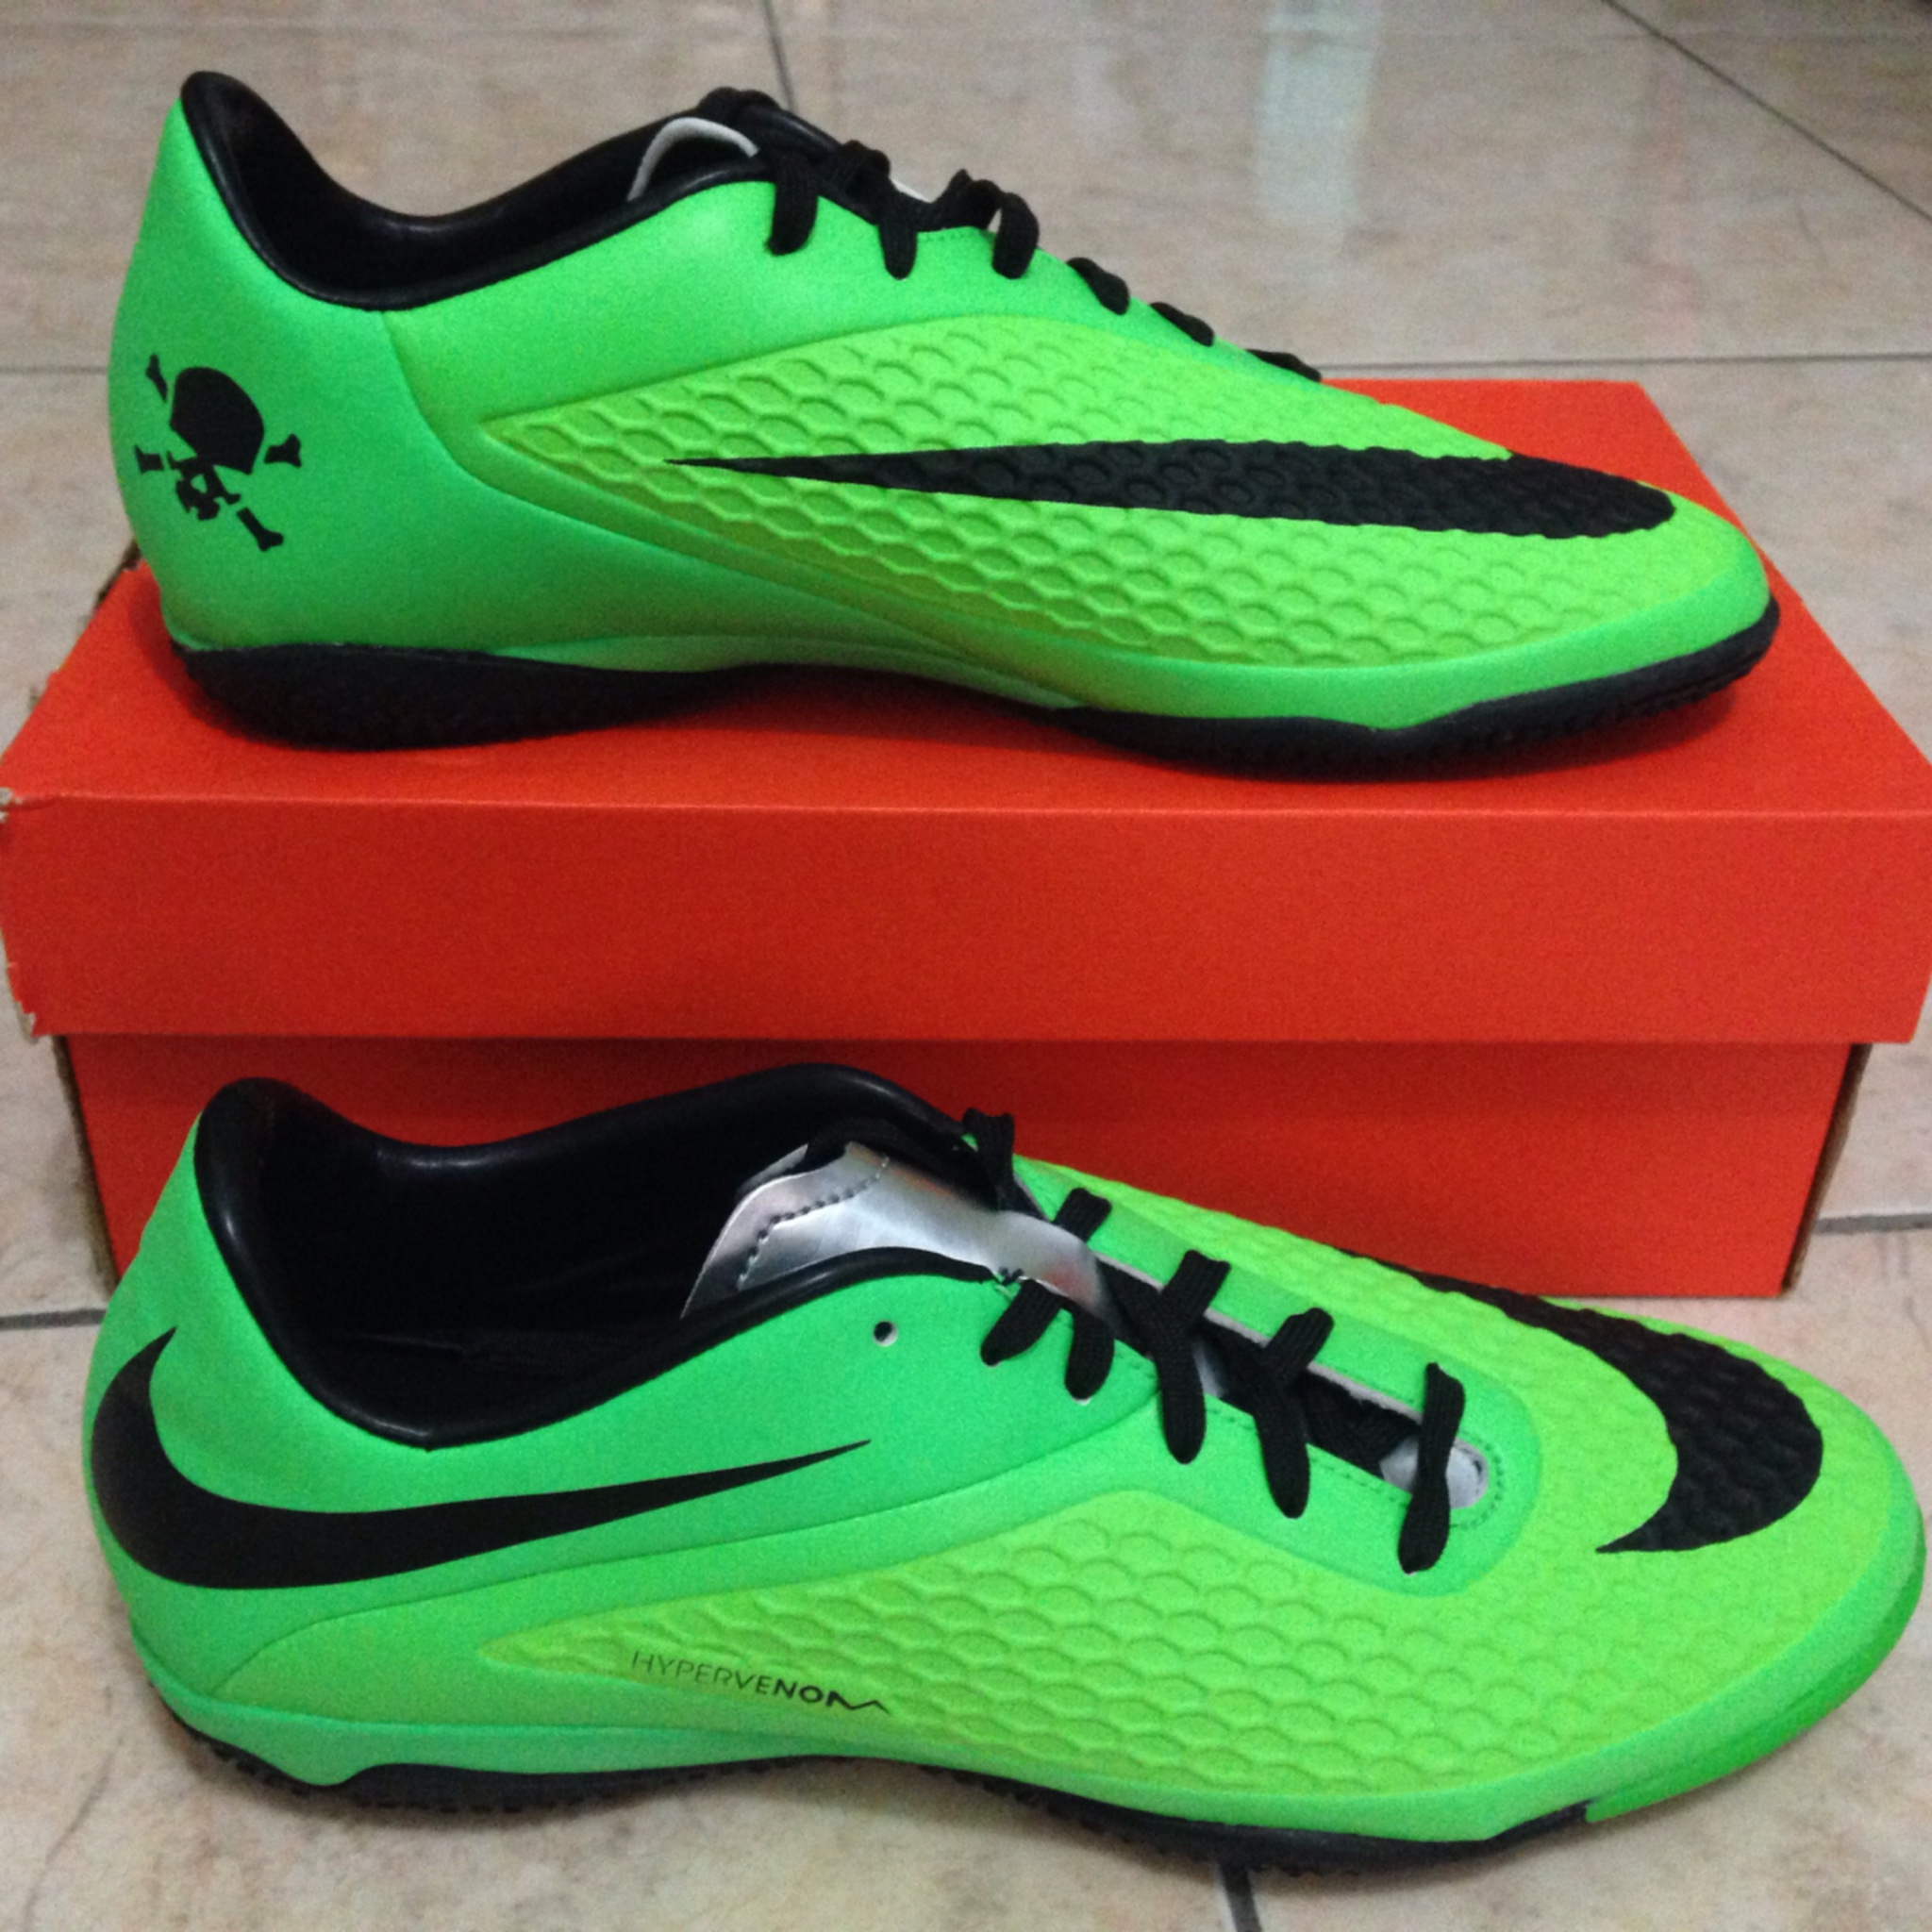 Harga Sepatu Futsal Nike Hypervenom Hijau Air Zoom Pegasus 33 Biru Phelon Size 40